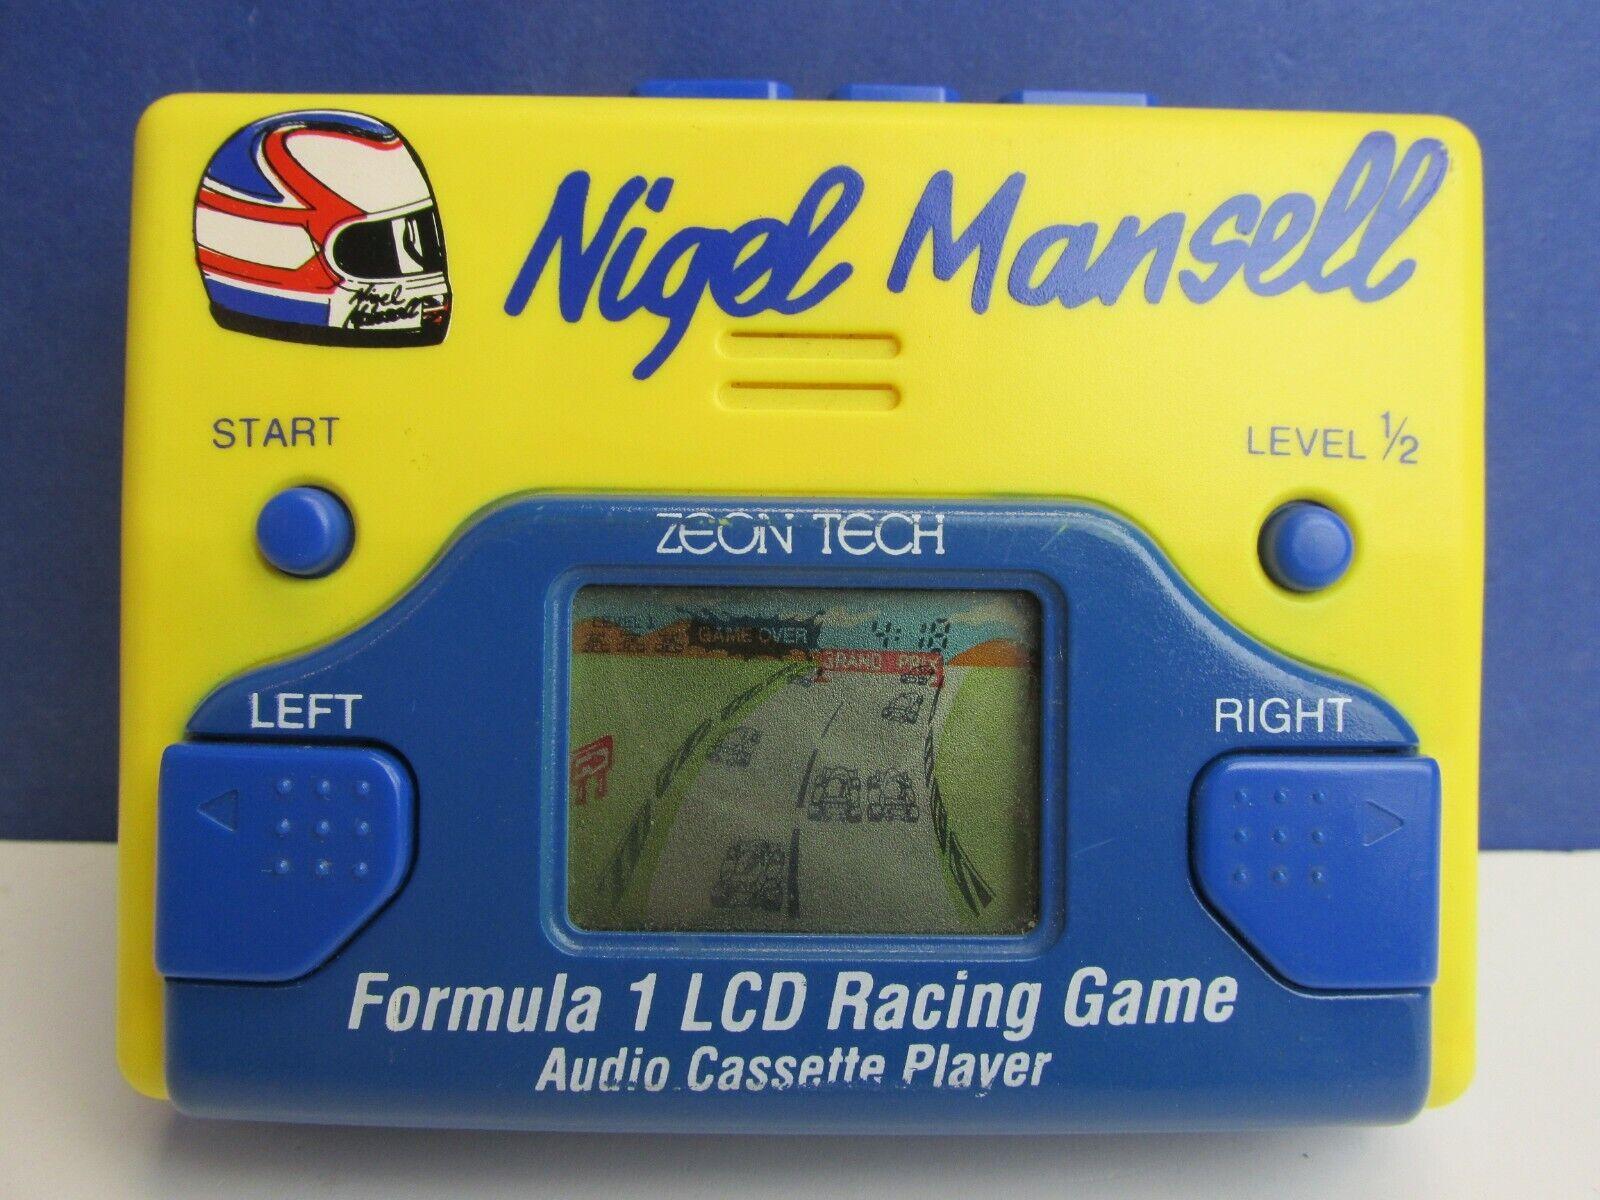 Rara Vintage Nigel Mansell LCD Video Juego & Cinta Cassette Zeon Tech fórmula 1